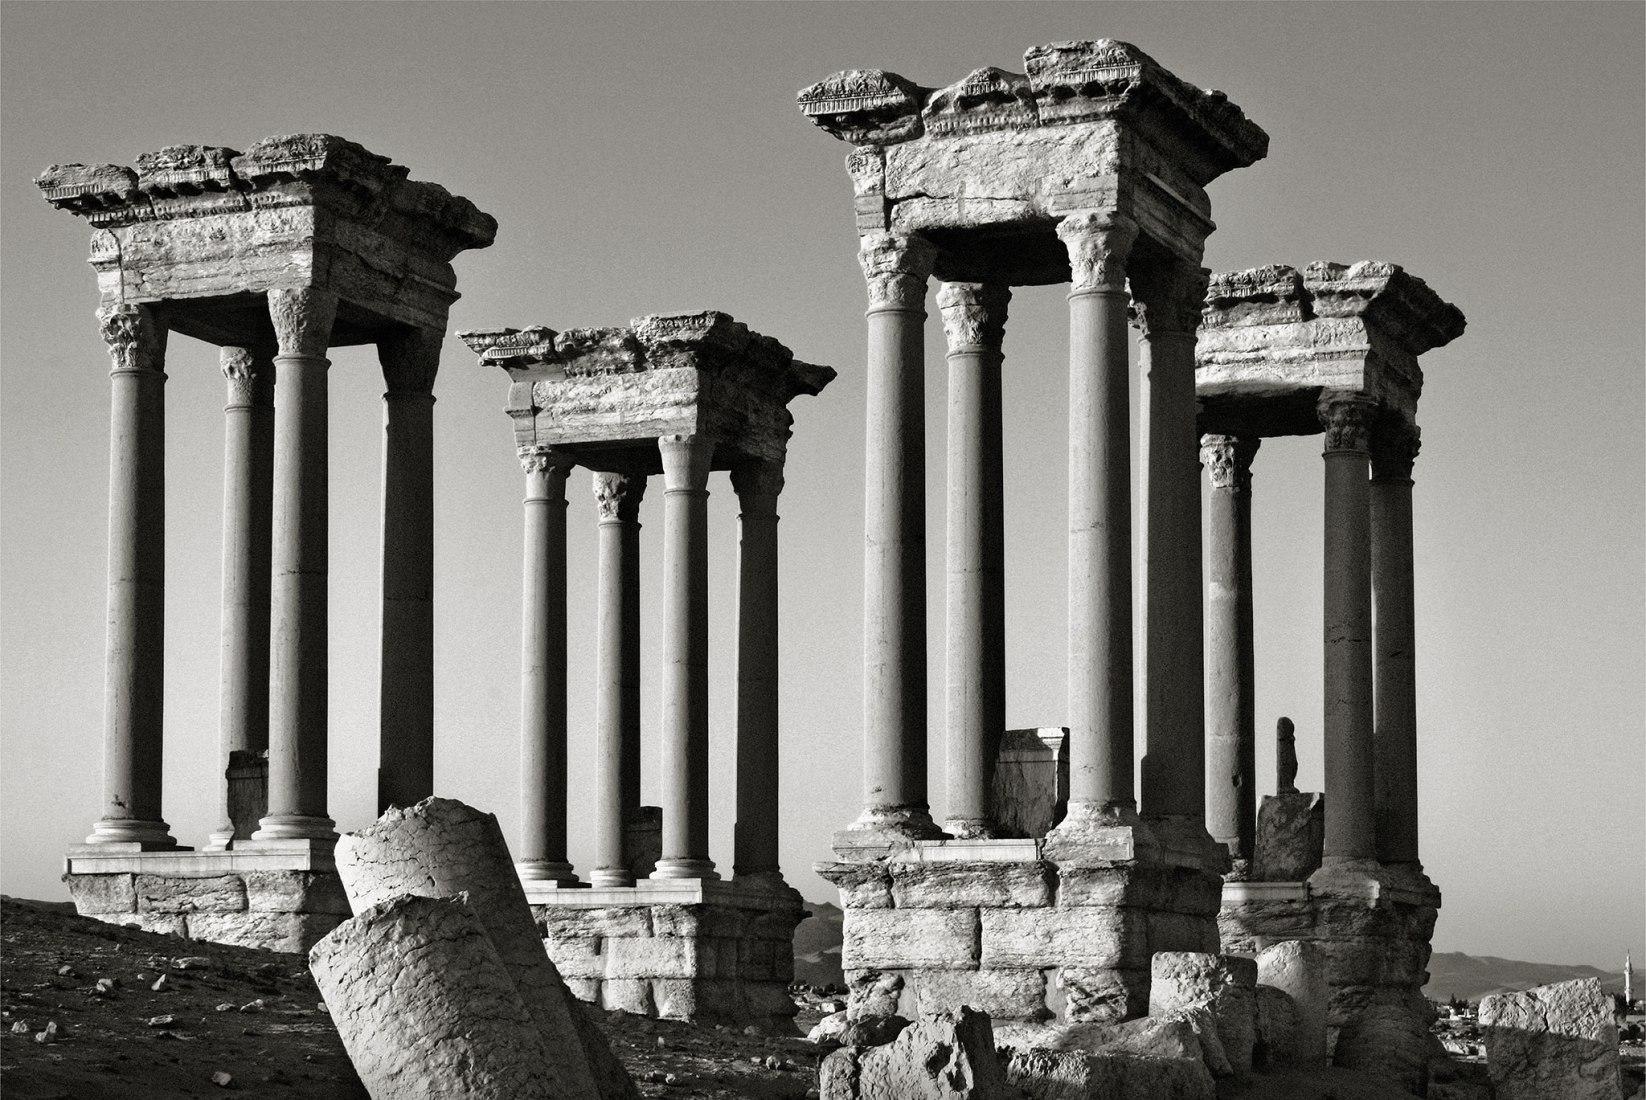 Palmira 1. Syria, an exhibition by Pío Cabanillas. Image courtesy of La Fábrica